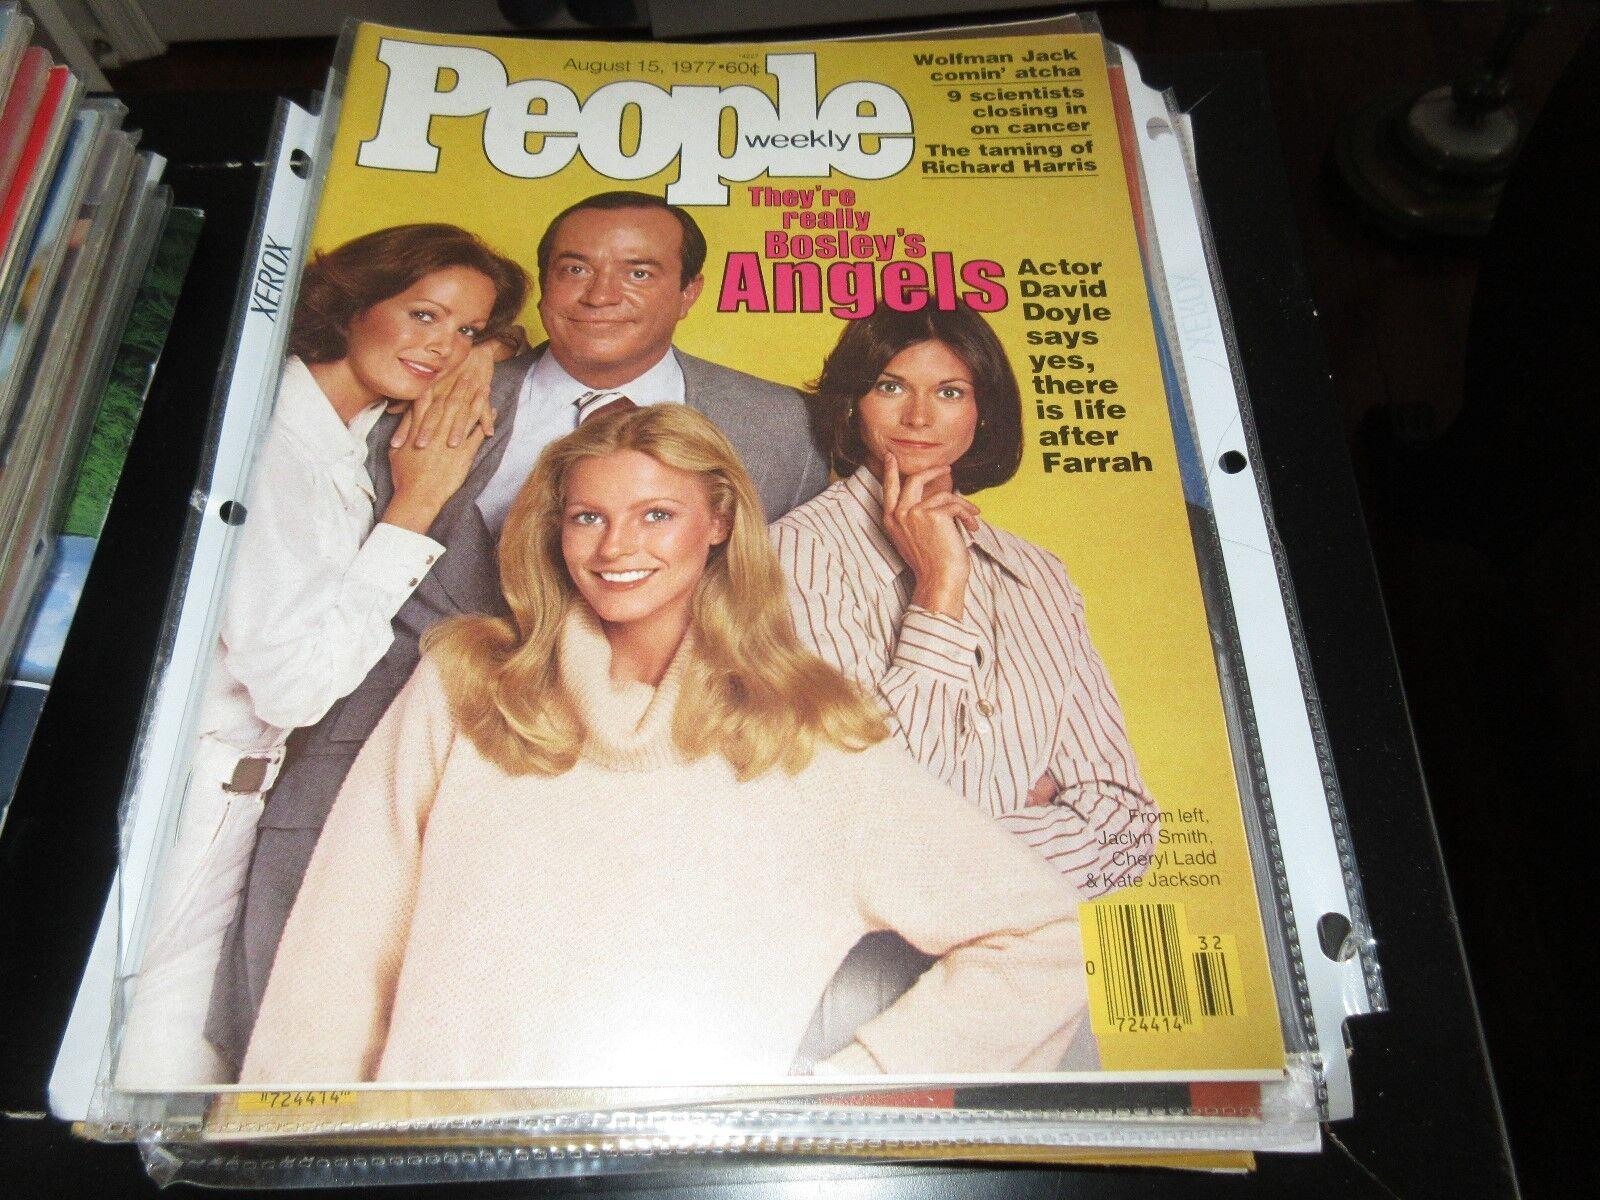 PEOPLE MAGAZINE , 8/15/77 , Bosley's Angels , Farrah ,D